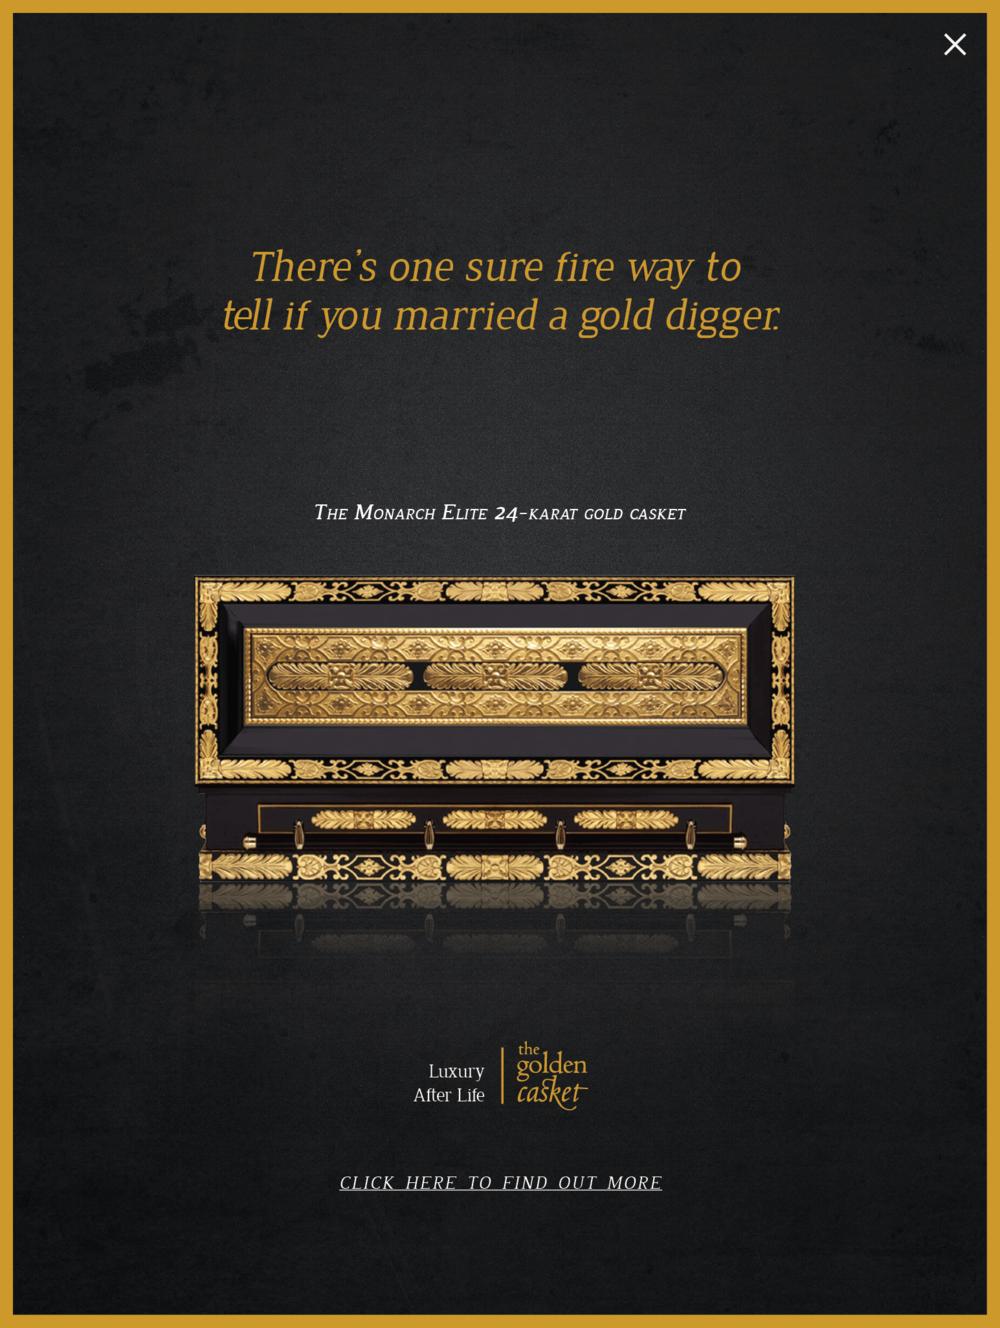 Updated Golden Casket Banner 2-03.png